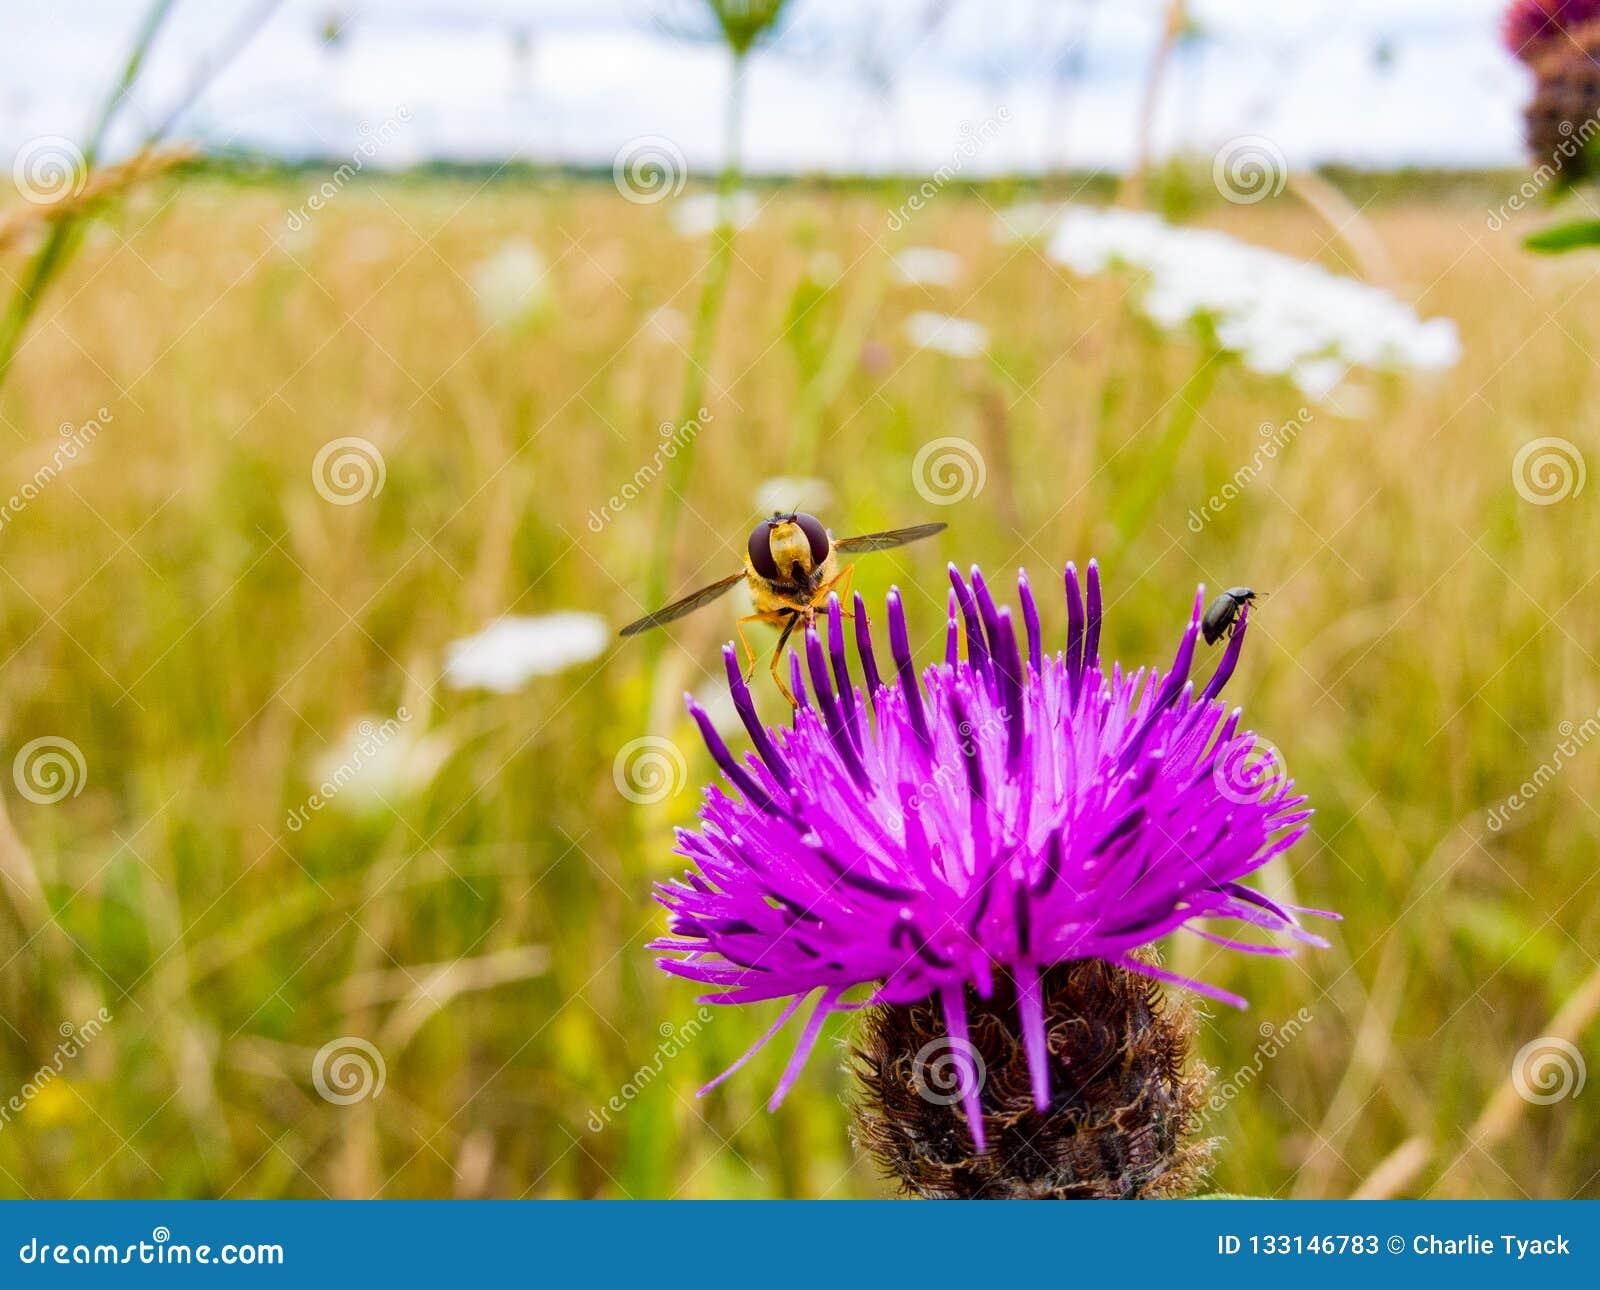 Hoverfly отдыхая на пинке/пурпурной голове цветка thistle